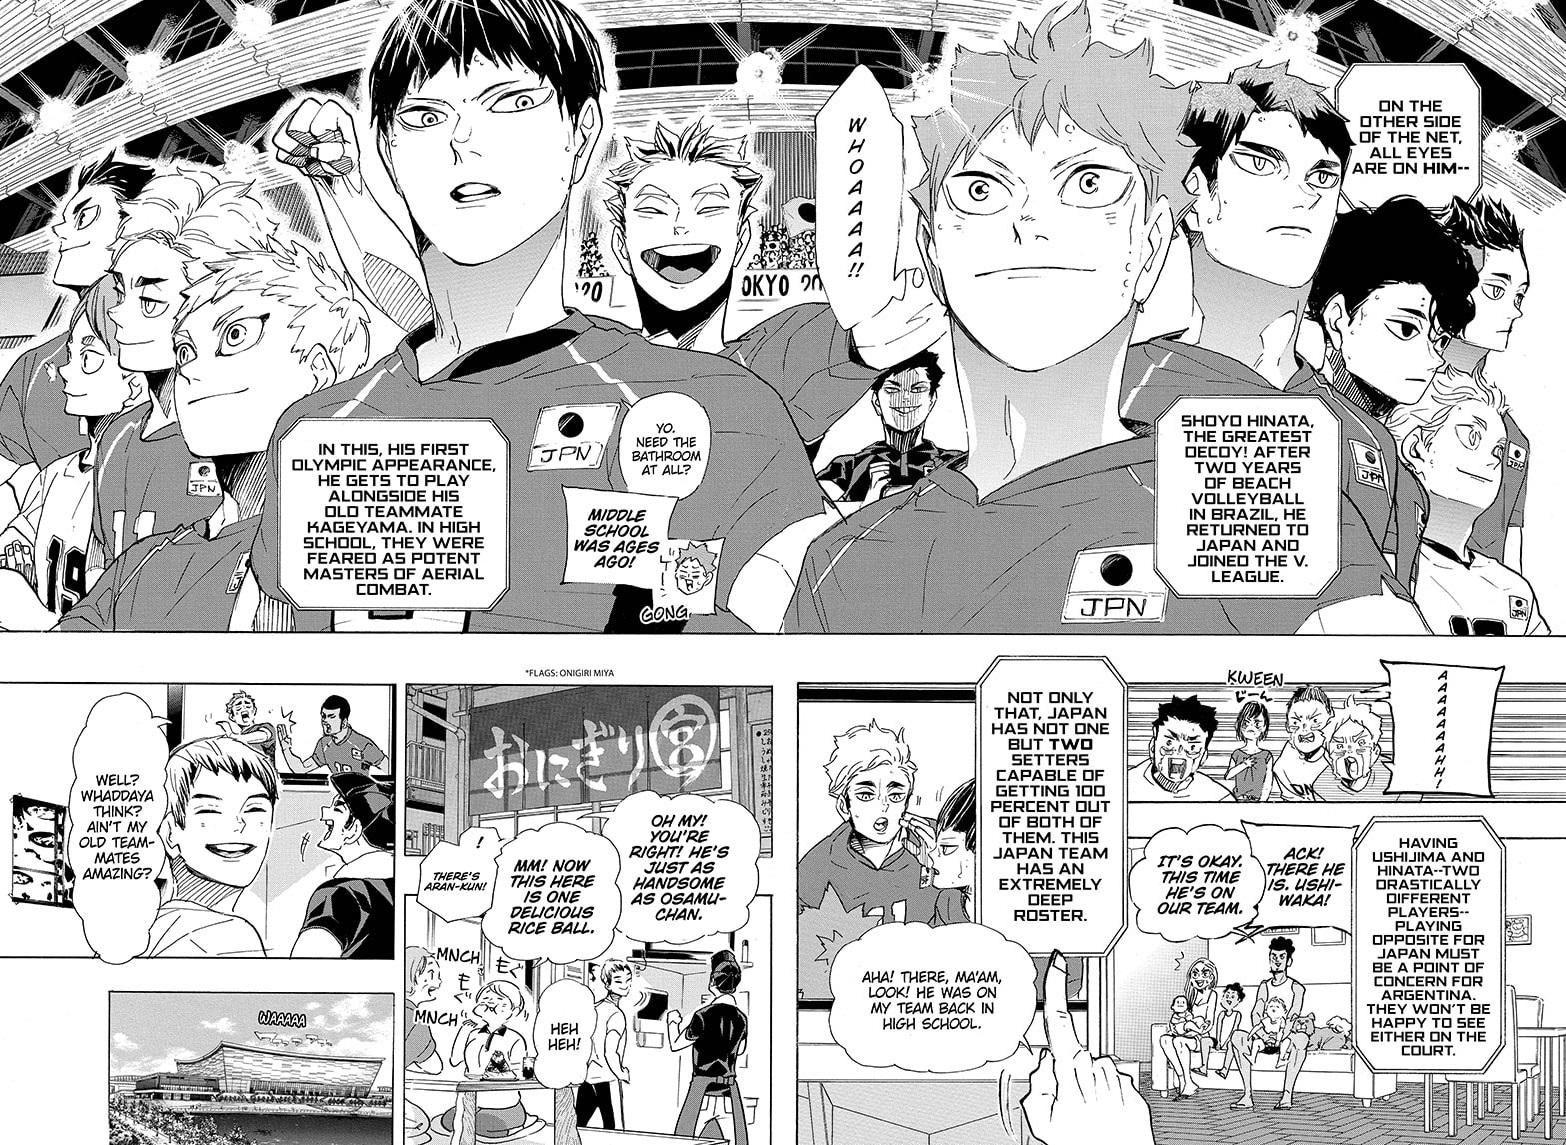 Haikyuu Chapter 402 Read Haikyuu Manga Online Haikyuu Manga Haikyuu Haikyuu Anime You can follow update the latest chapter haikyuu!! haikyuu manga haikyuu haikyuu anime